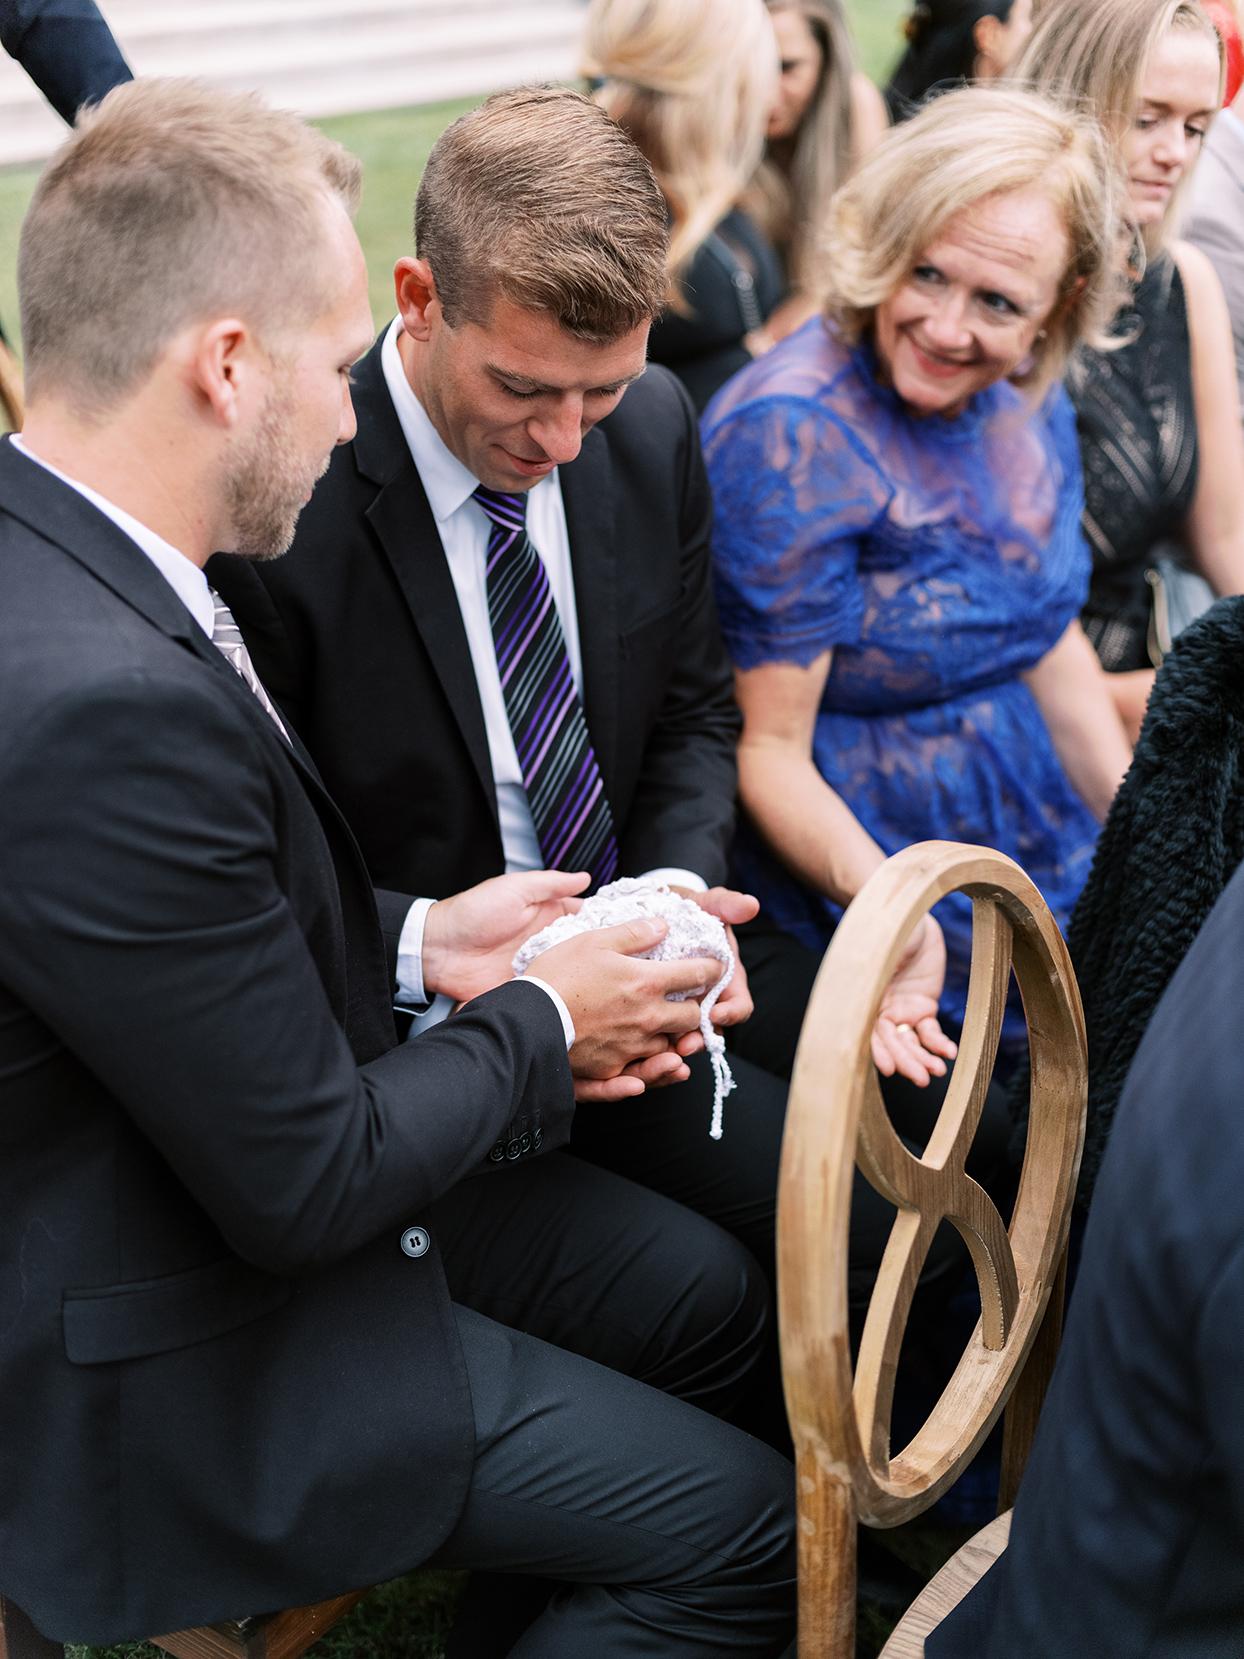 lauren chris wedding ceremony men holding bag of rings to warm them